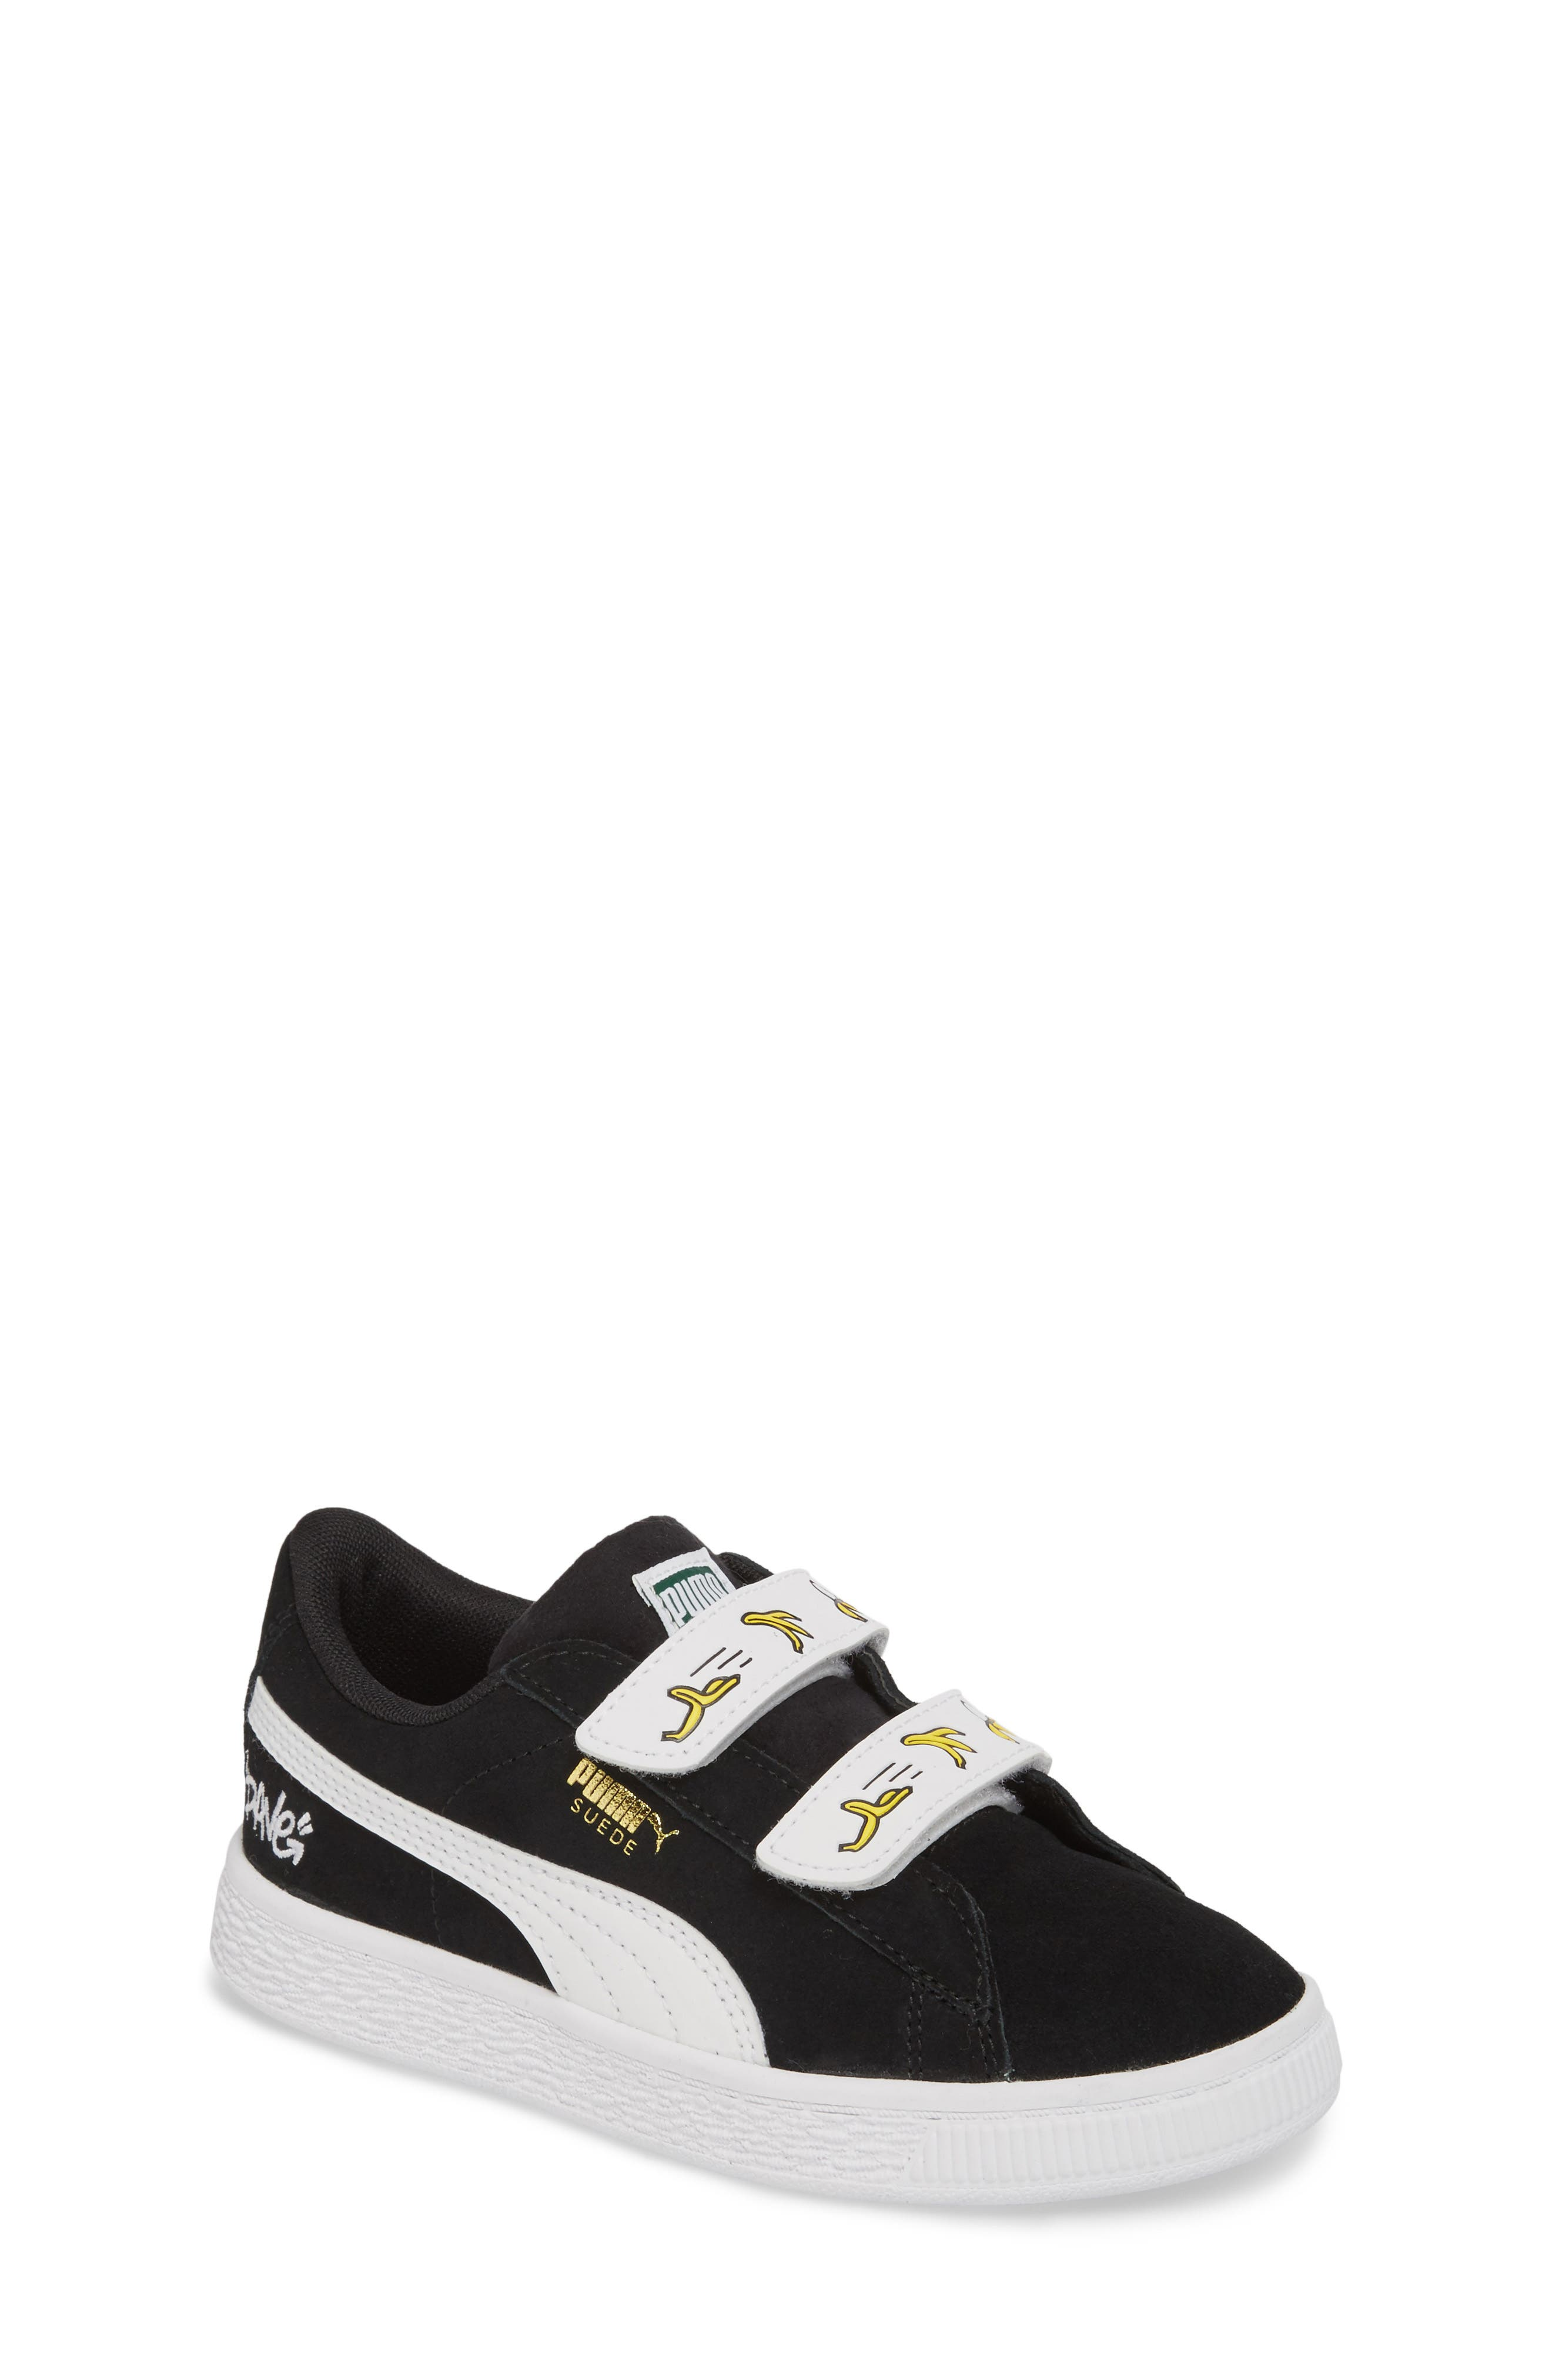 x Minions Suede V Sneaker,                         Main,                         color, 001